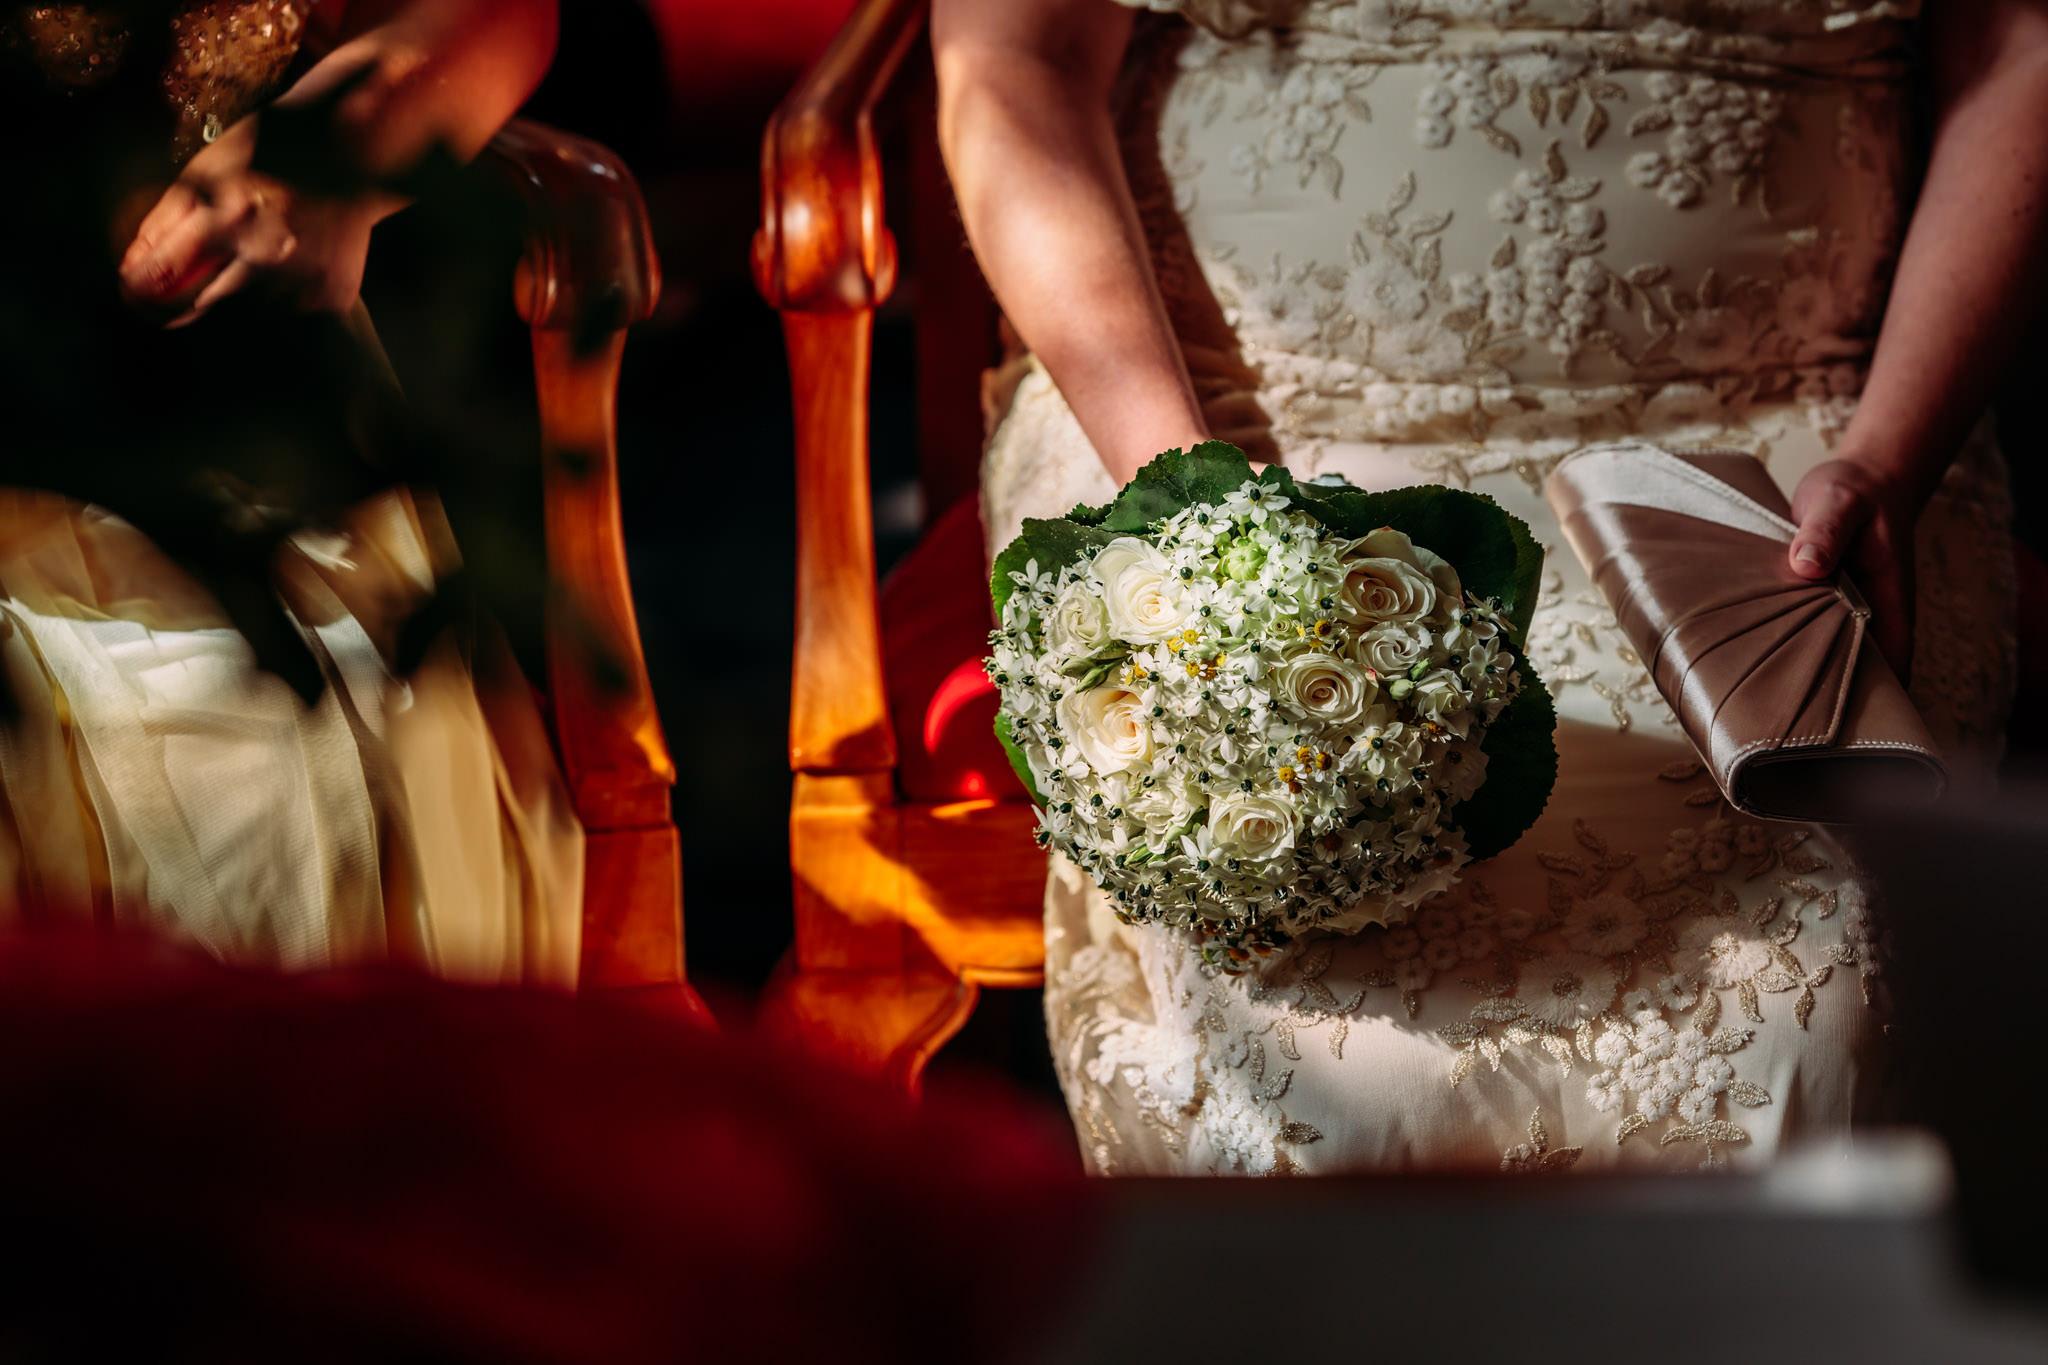 180825_Hochzeit_Berlin_Wannsee_Almhuette_Loretta_web_0004.jpg